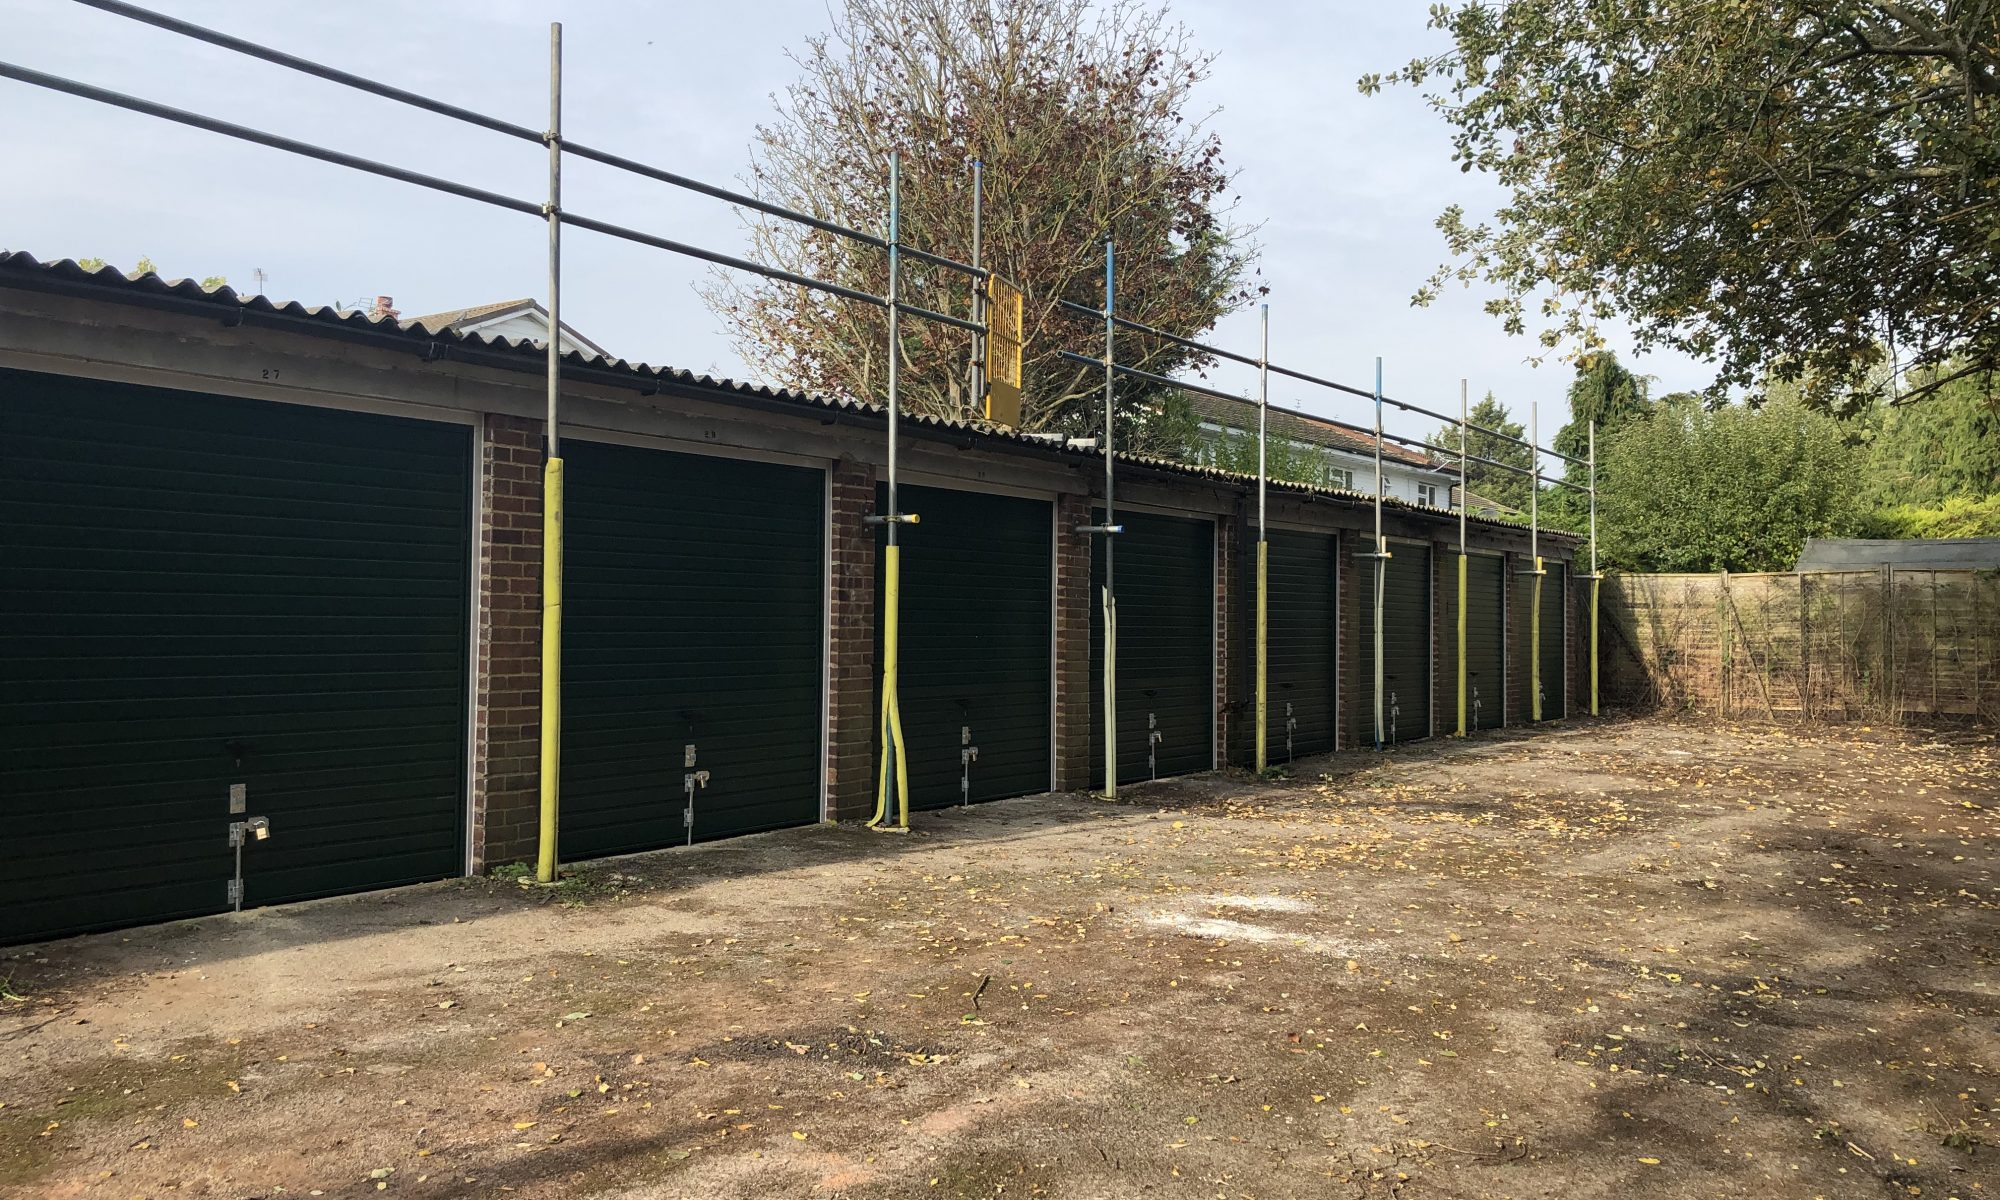 Refurbished Garages in Windsor to rent from Garage rental company in Windsor